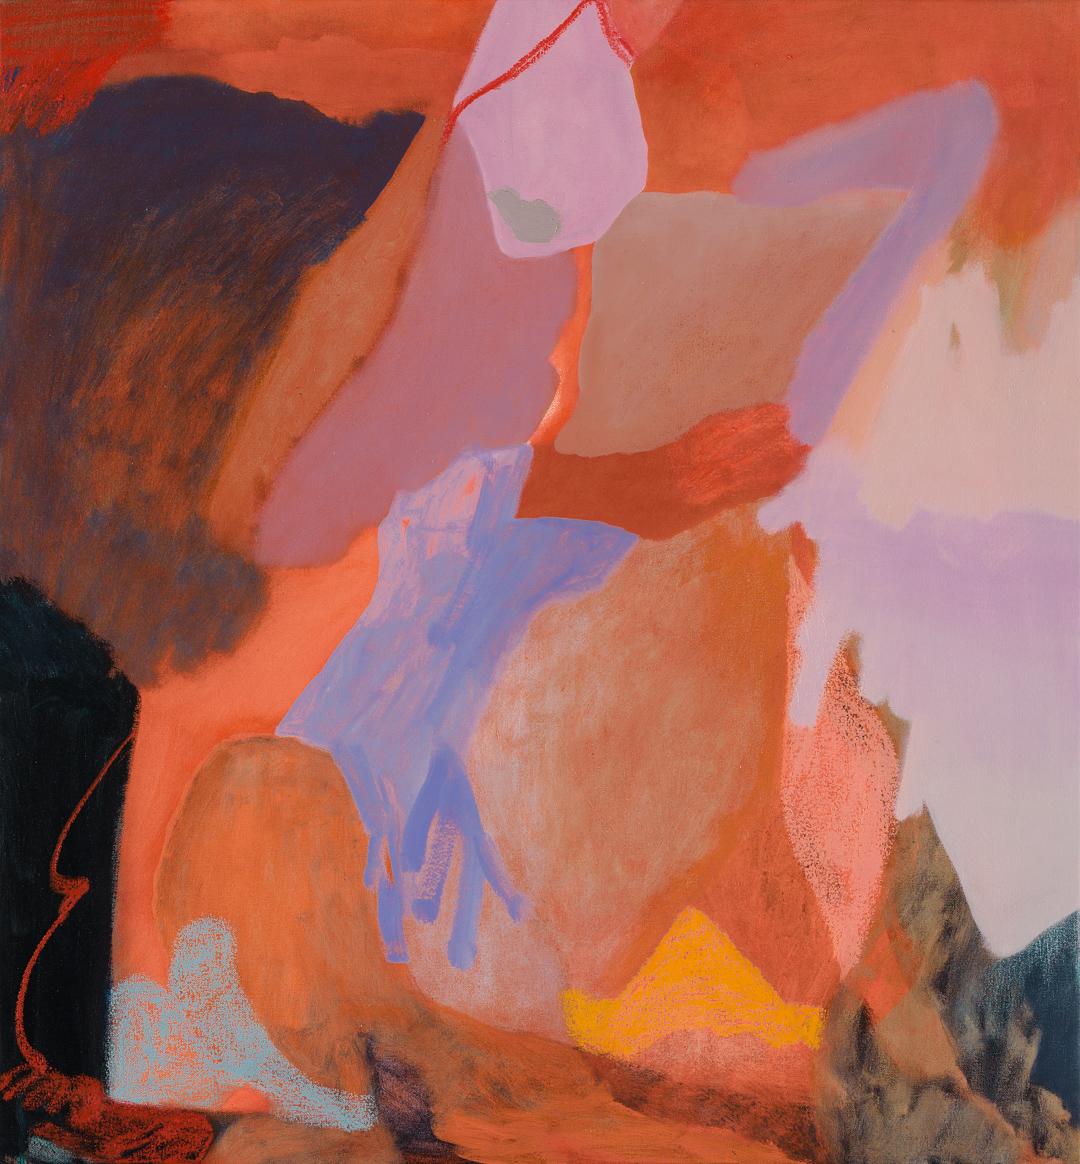 TONEE MESSIAH  Self Fulfilling Feedback  2017 oil on canvas 76 × 71 cm